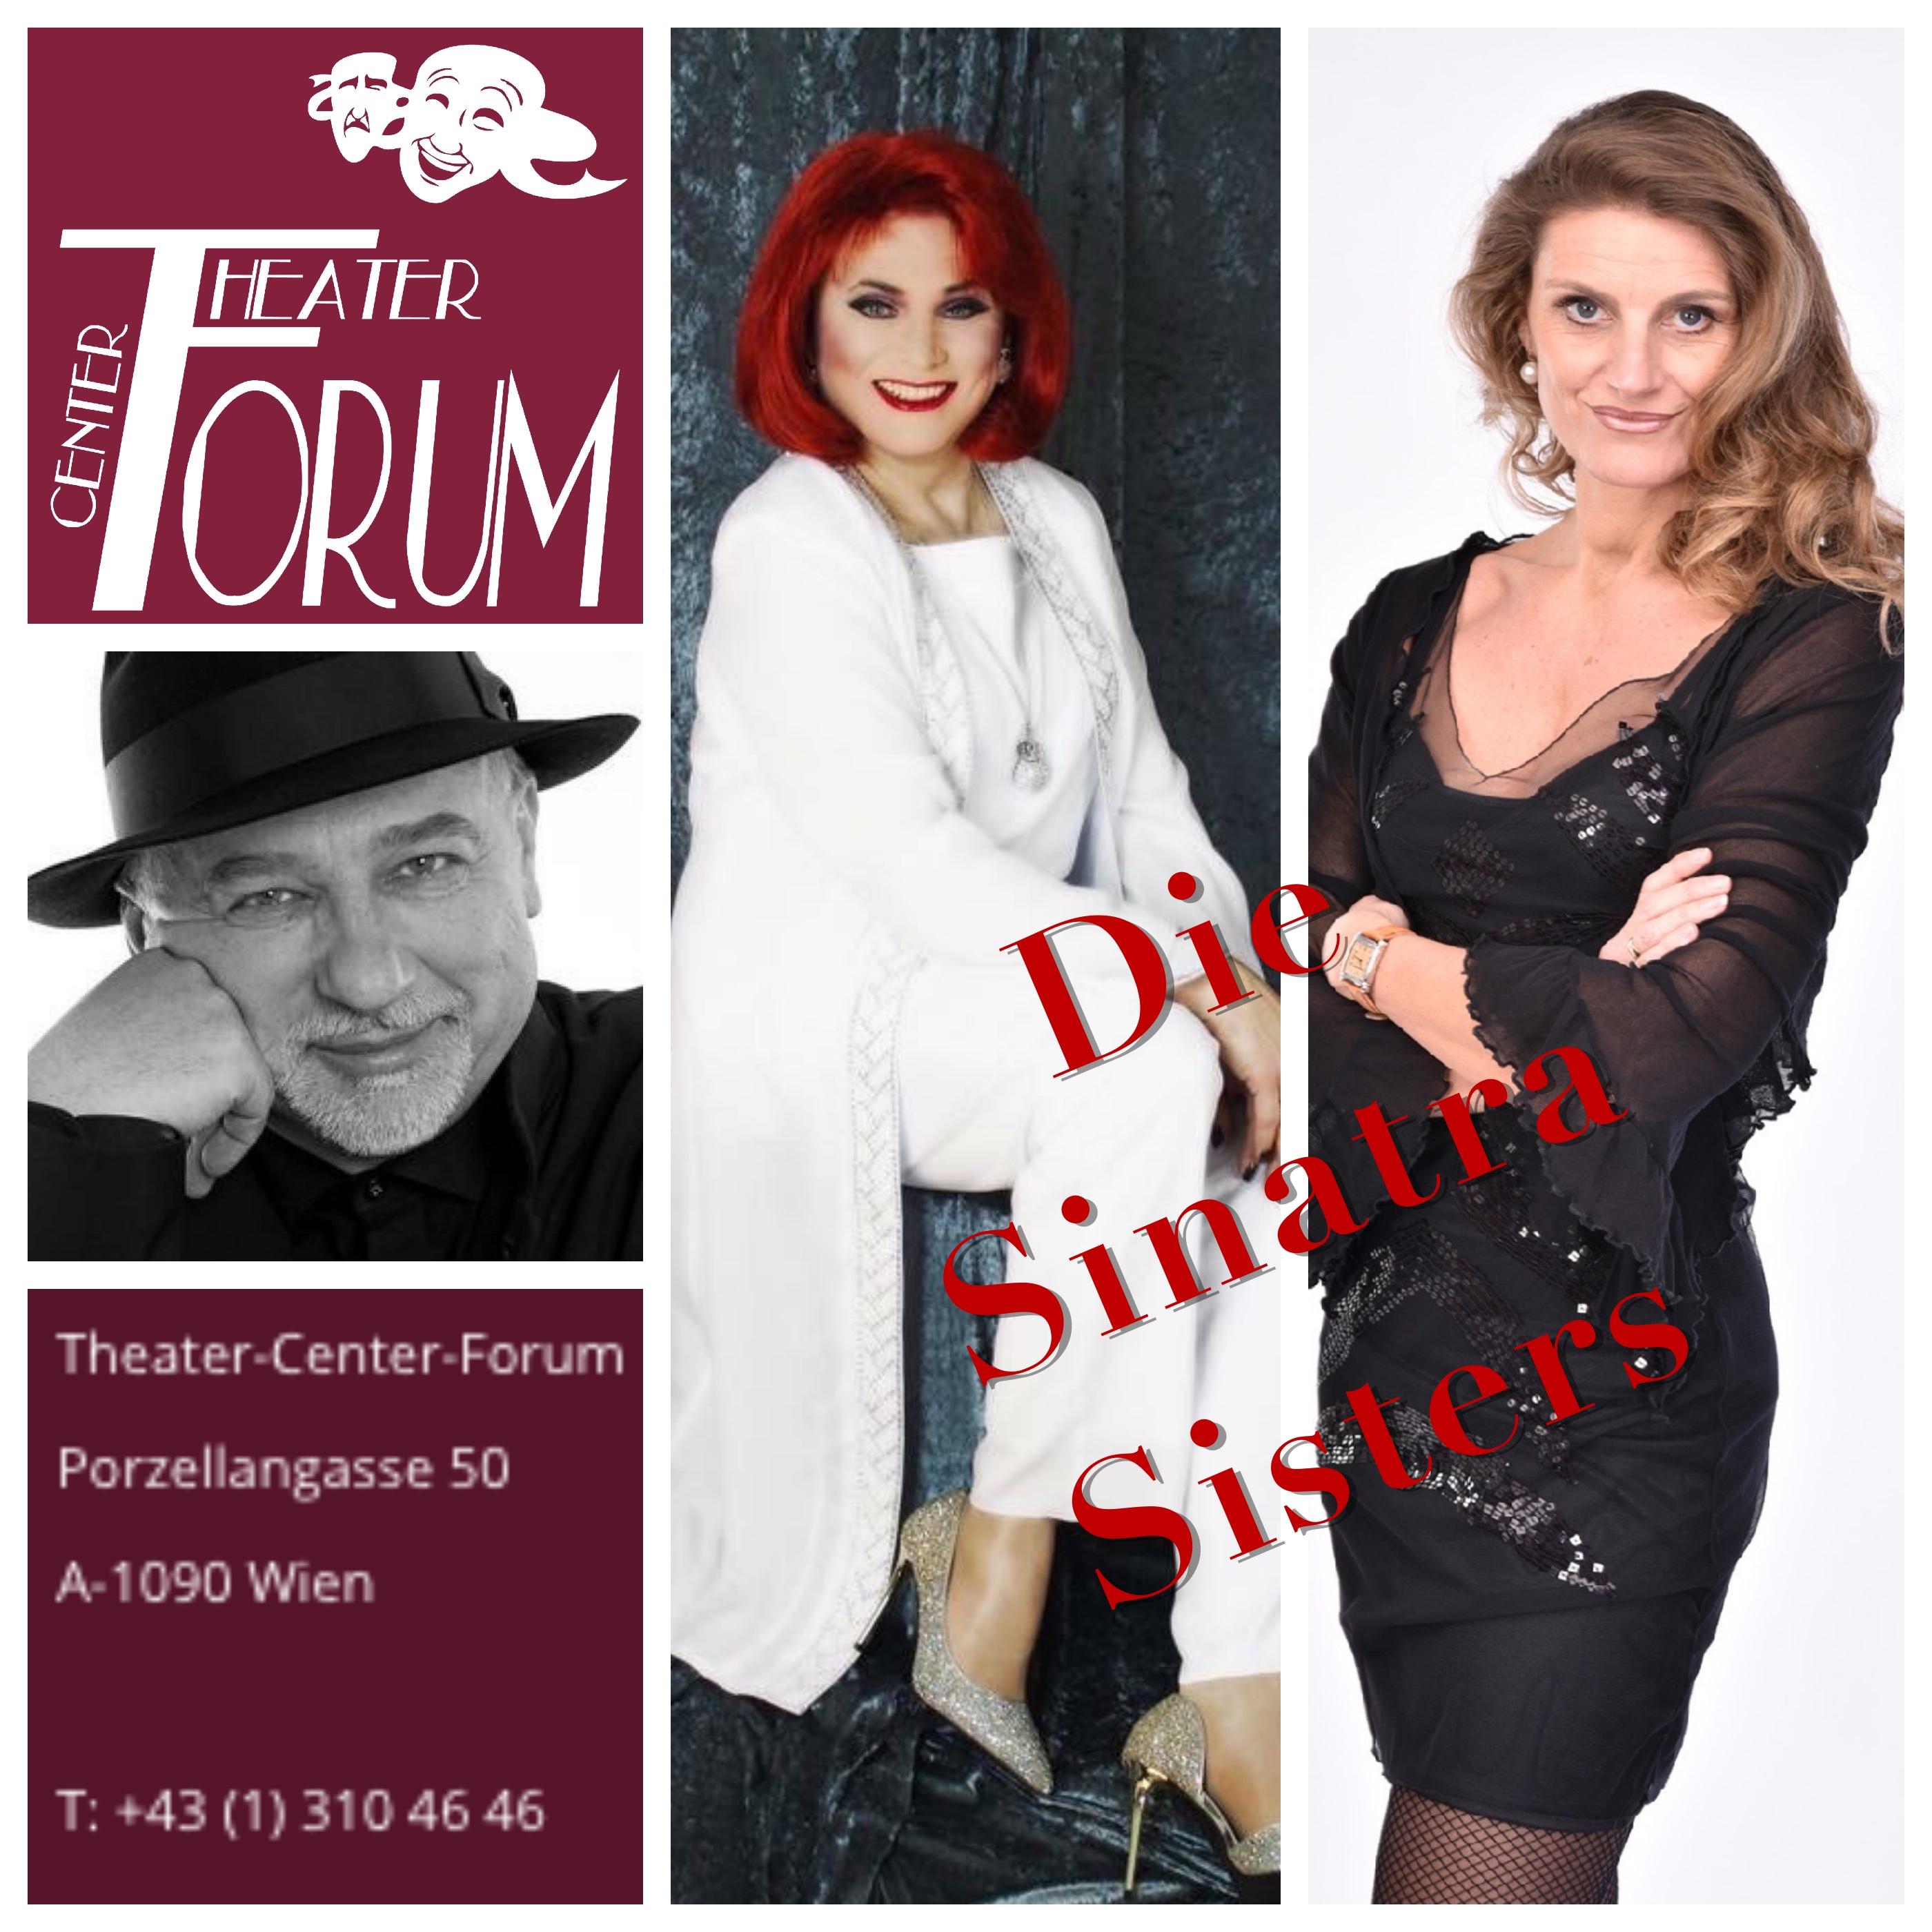 Center Forum